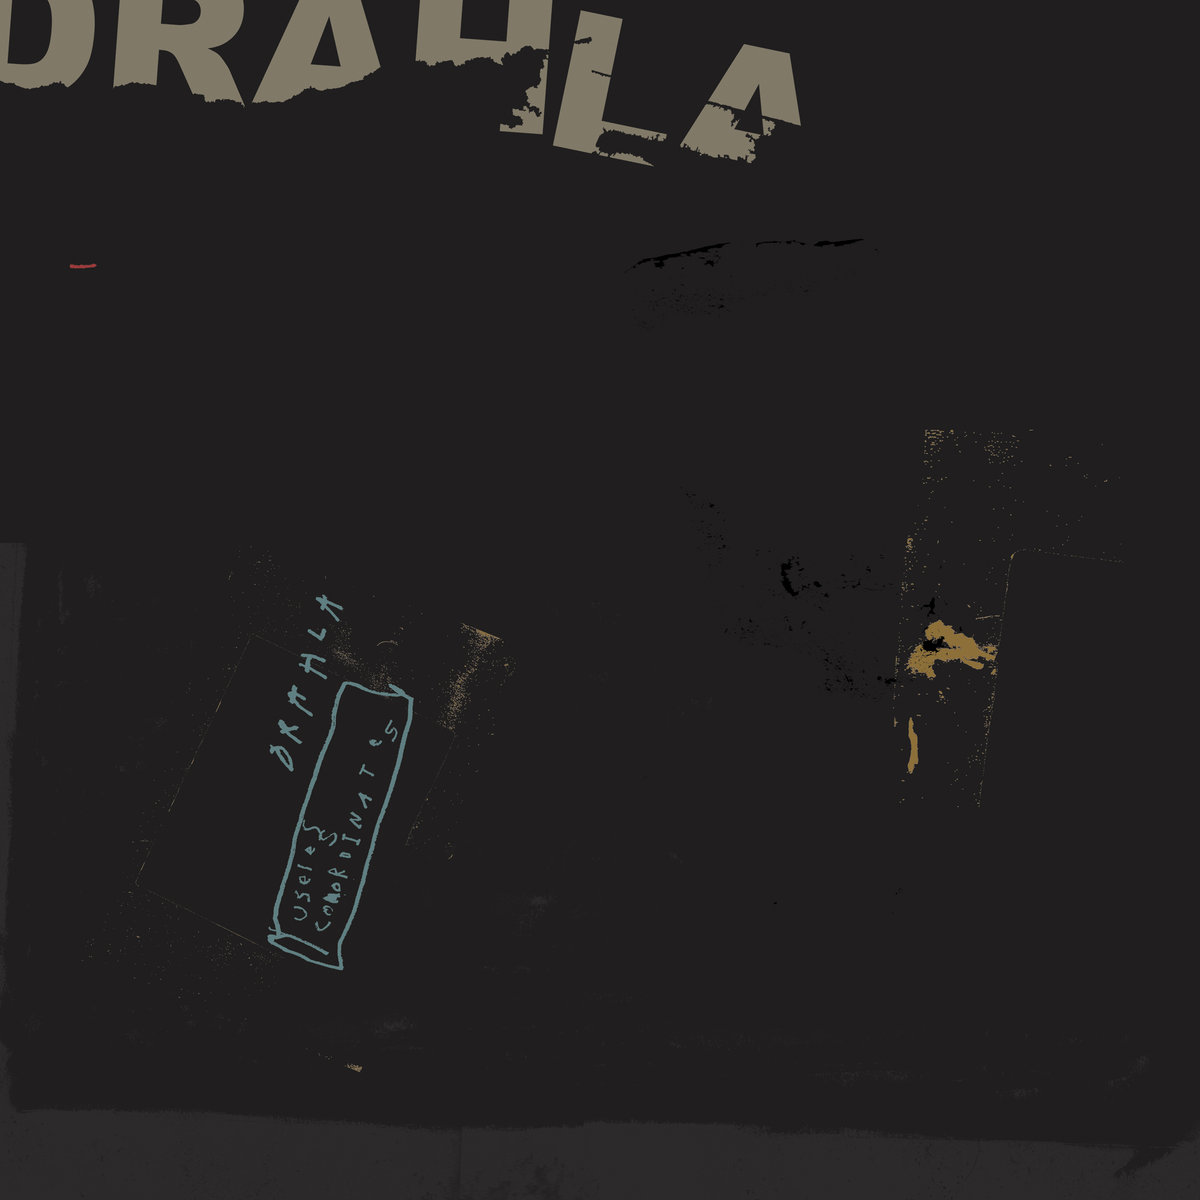 Drahla - Useless Coordinates LP